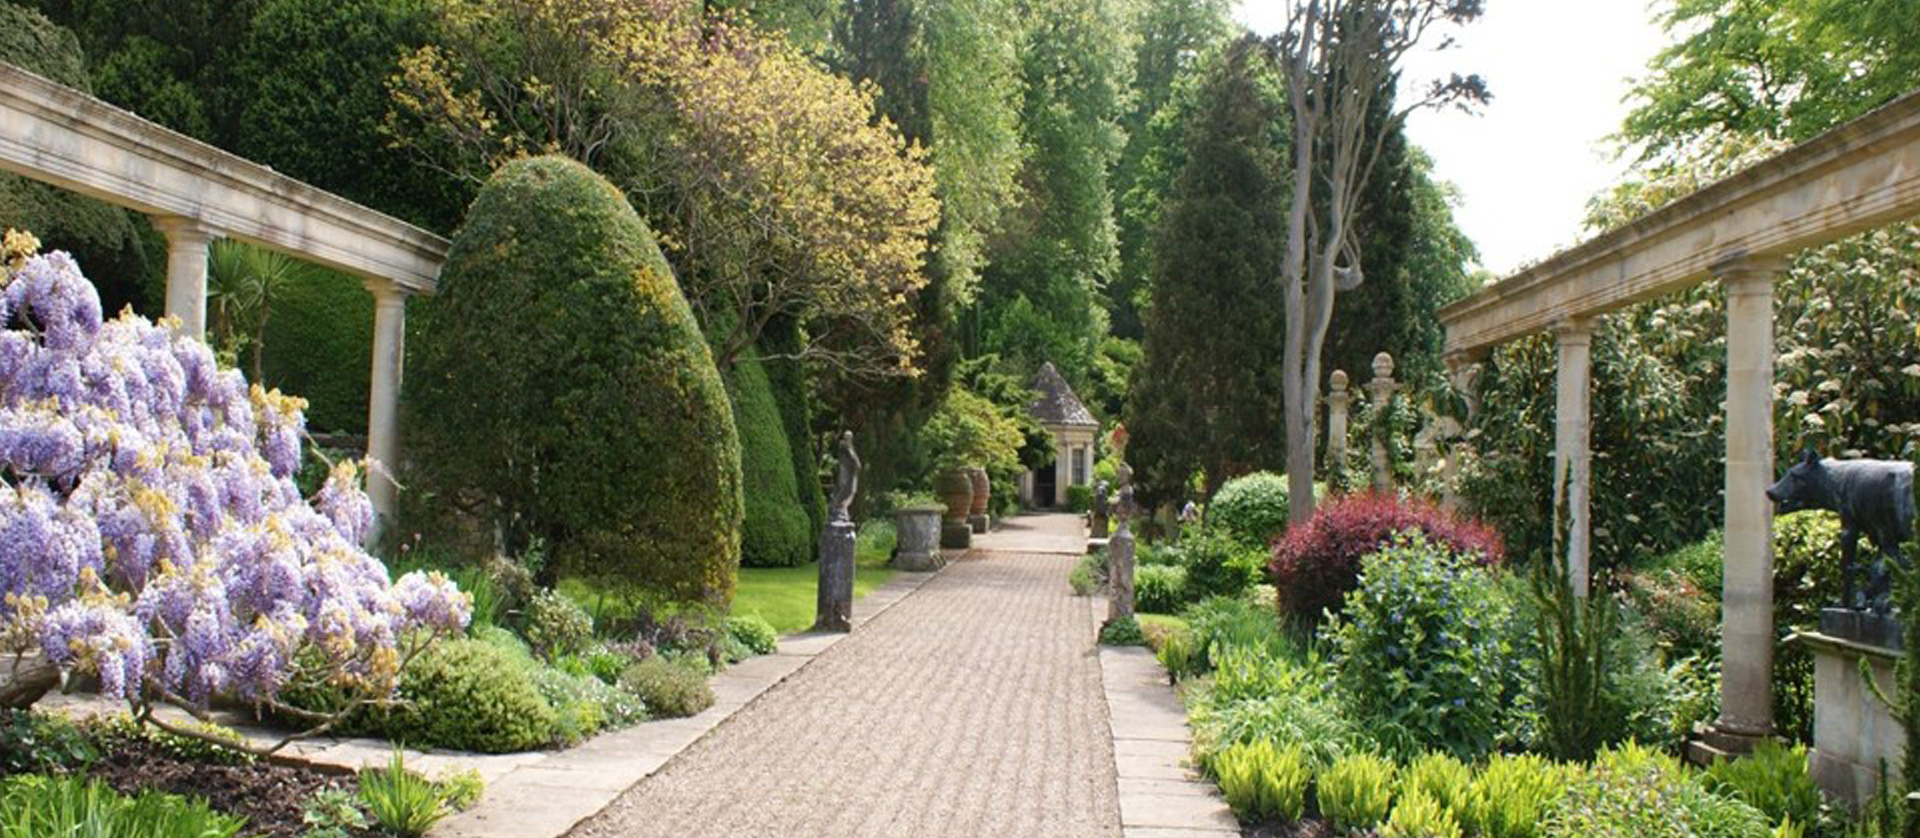 John-Horsey-Horticulture-Gardening-Devon